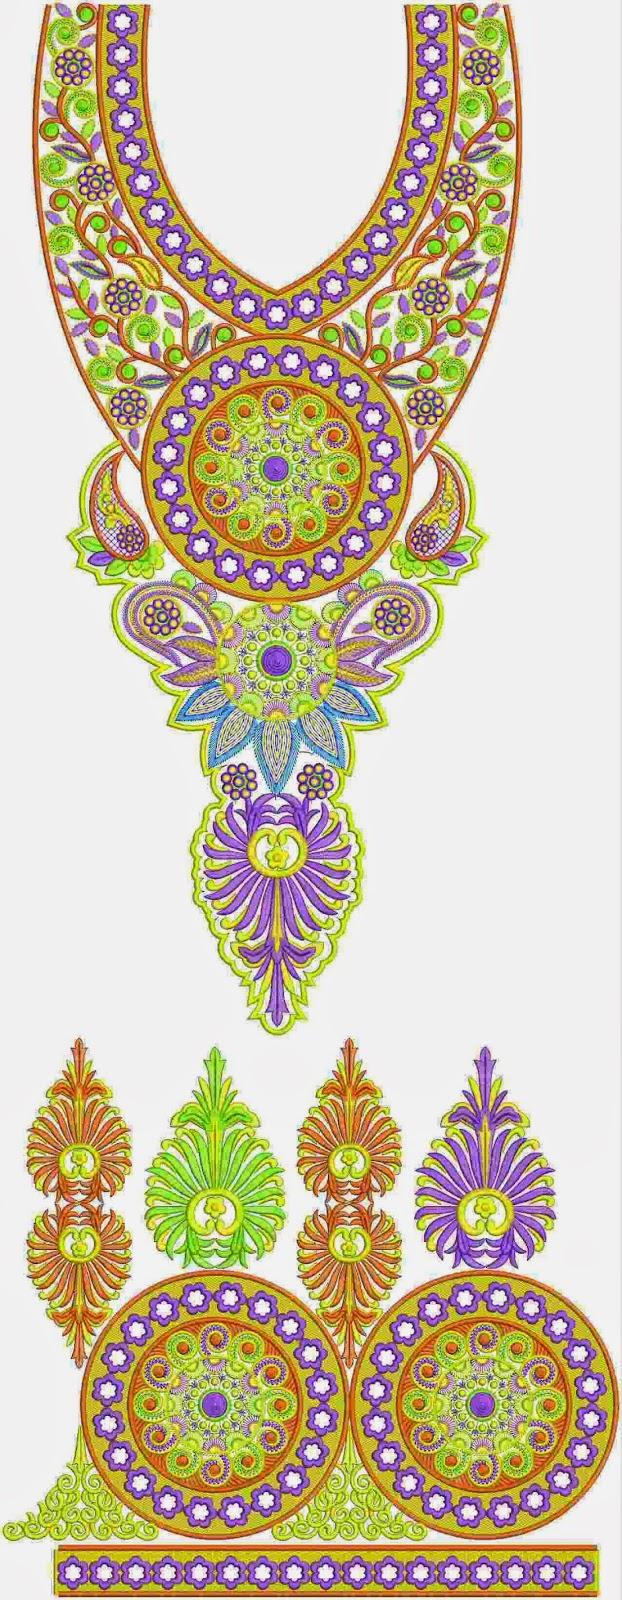 swaar primitief borduurwerk Kurti rok ontwerp